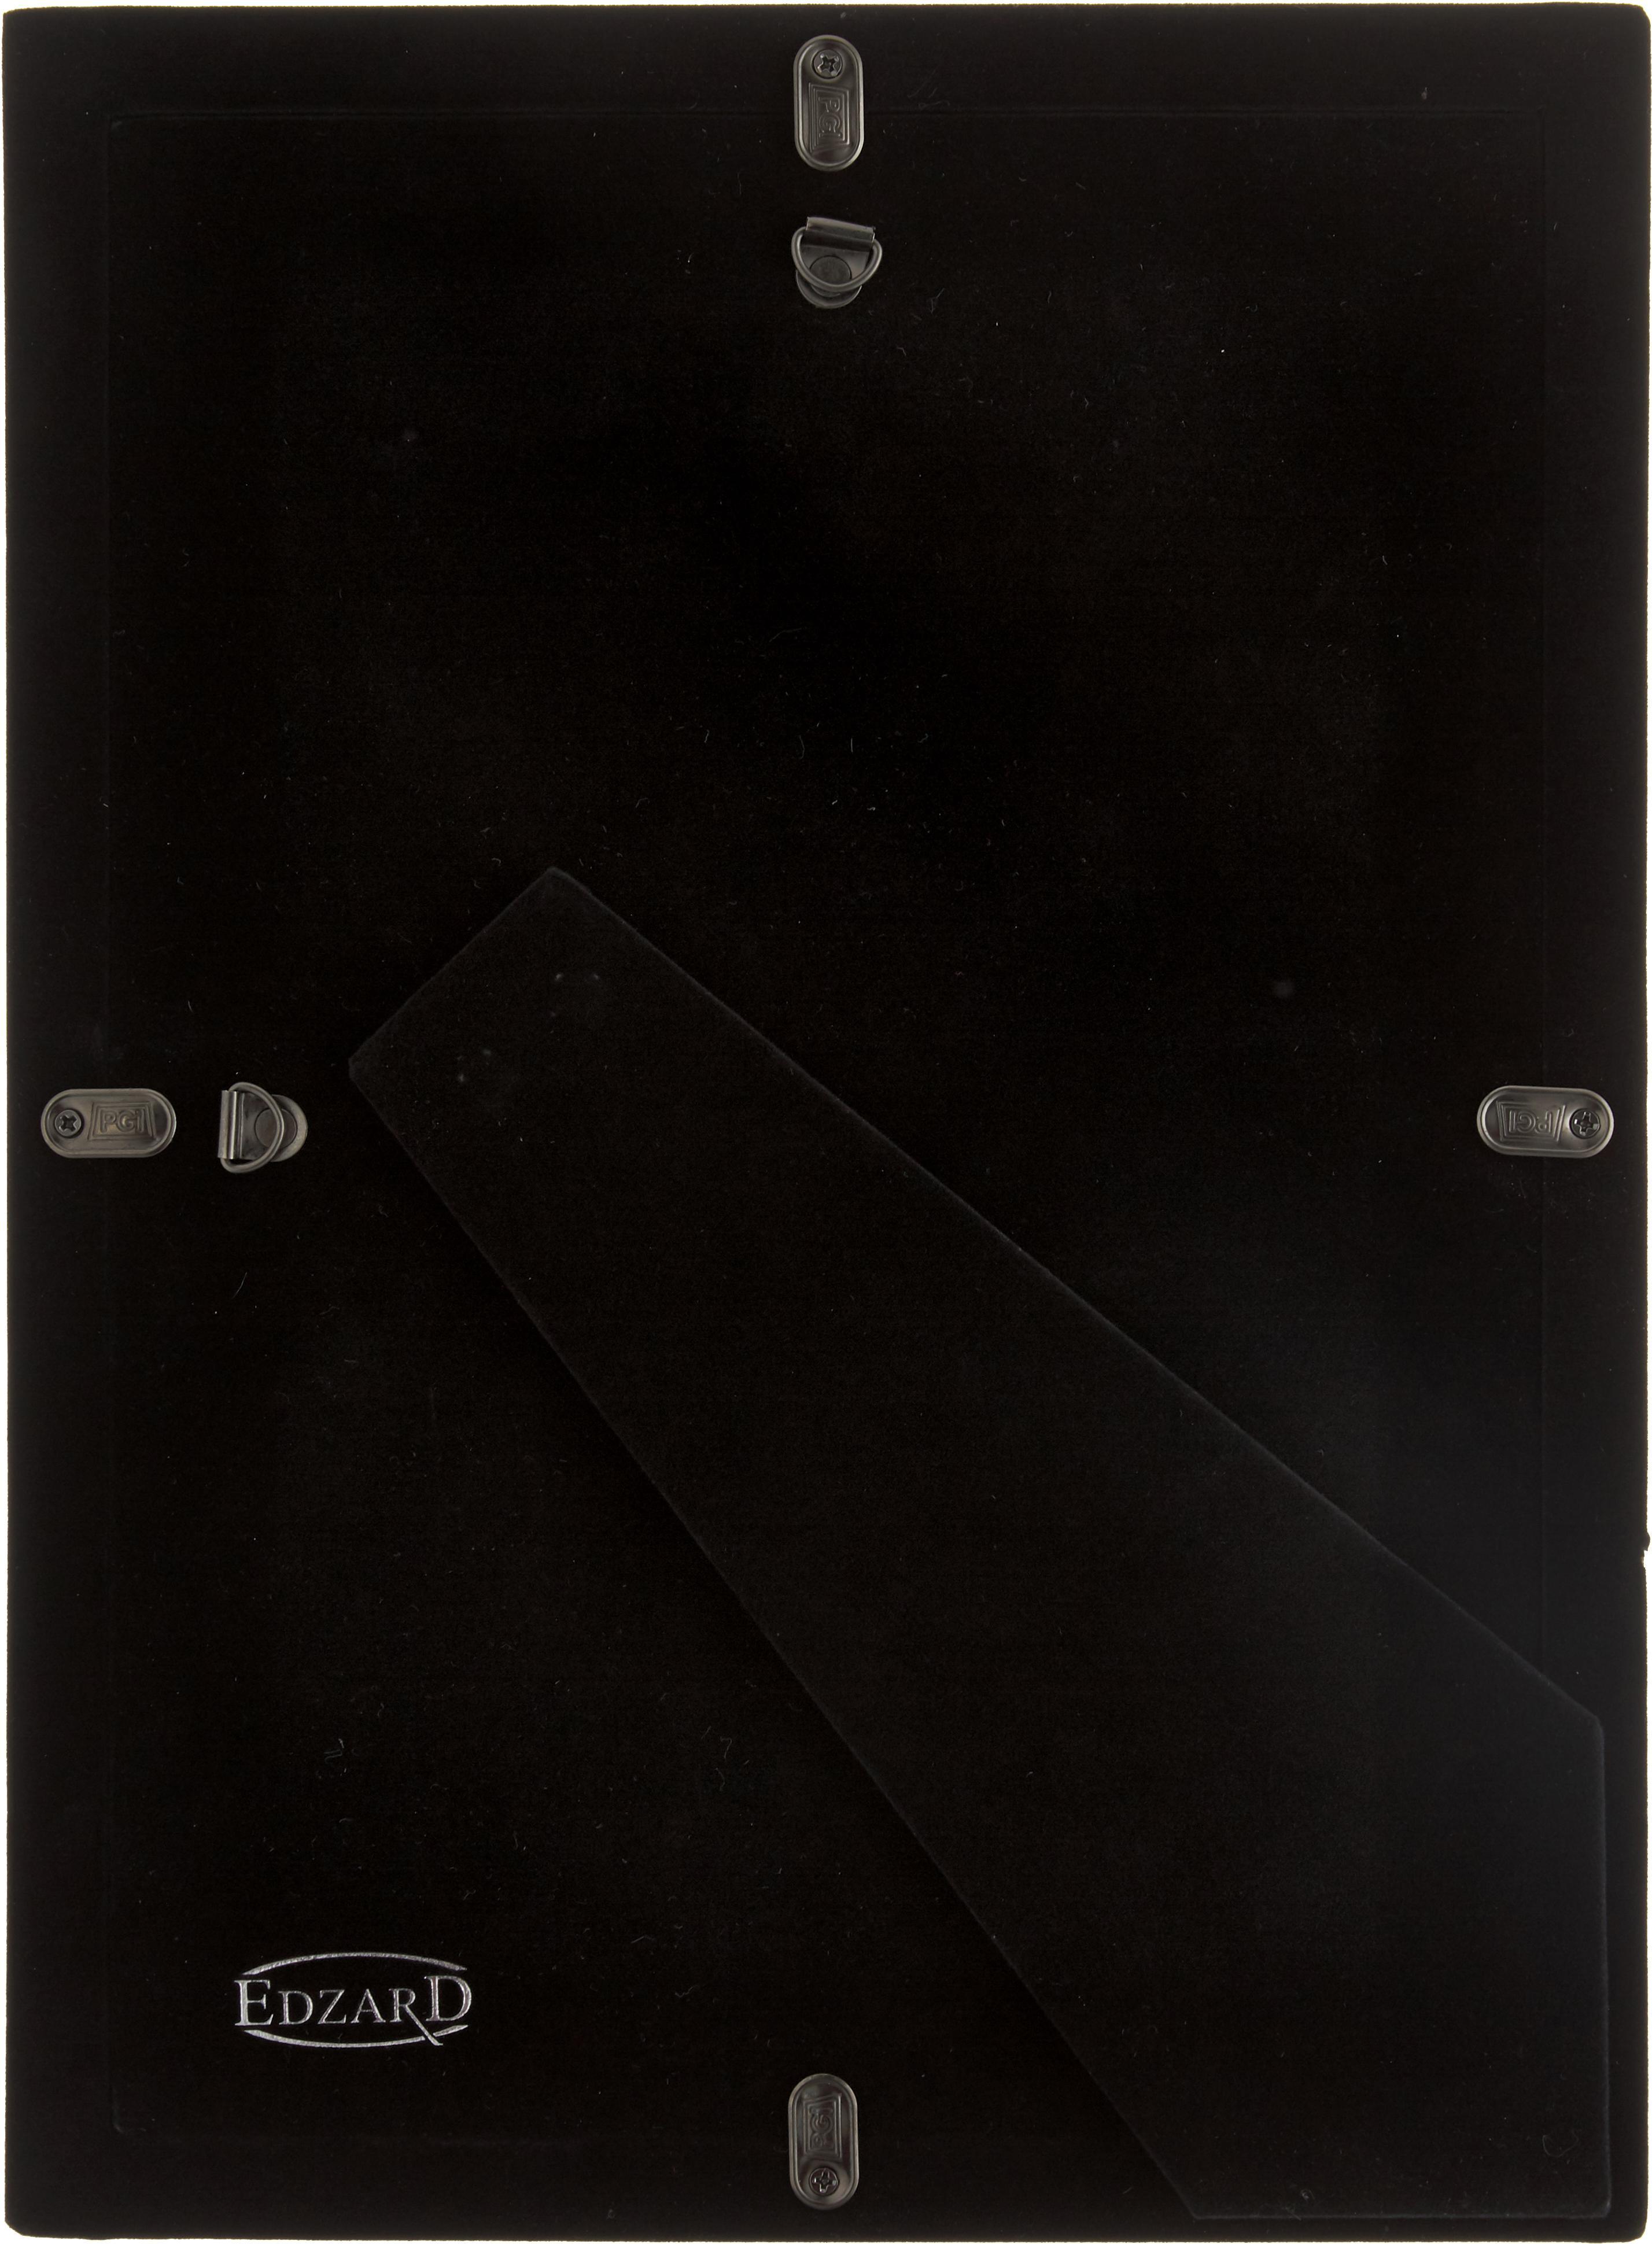 Bilderrahmen Carrara, Rahmen: Stahl, versilbert, Front: Glas, Rahmen: SilberfarbenFront: Transparent, 20 x 30 cm